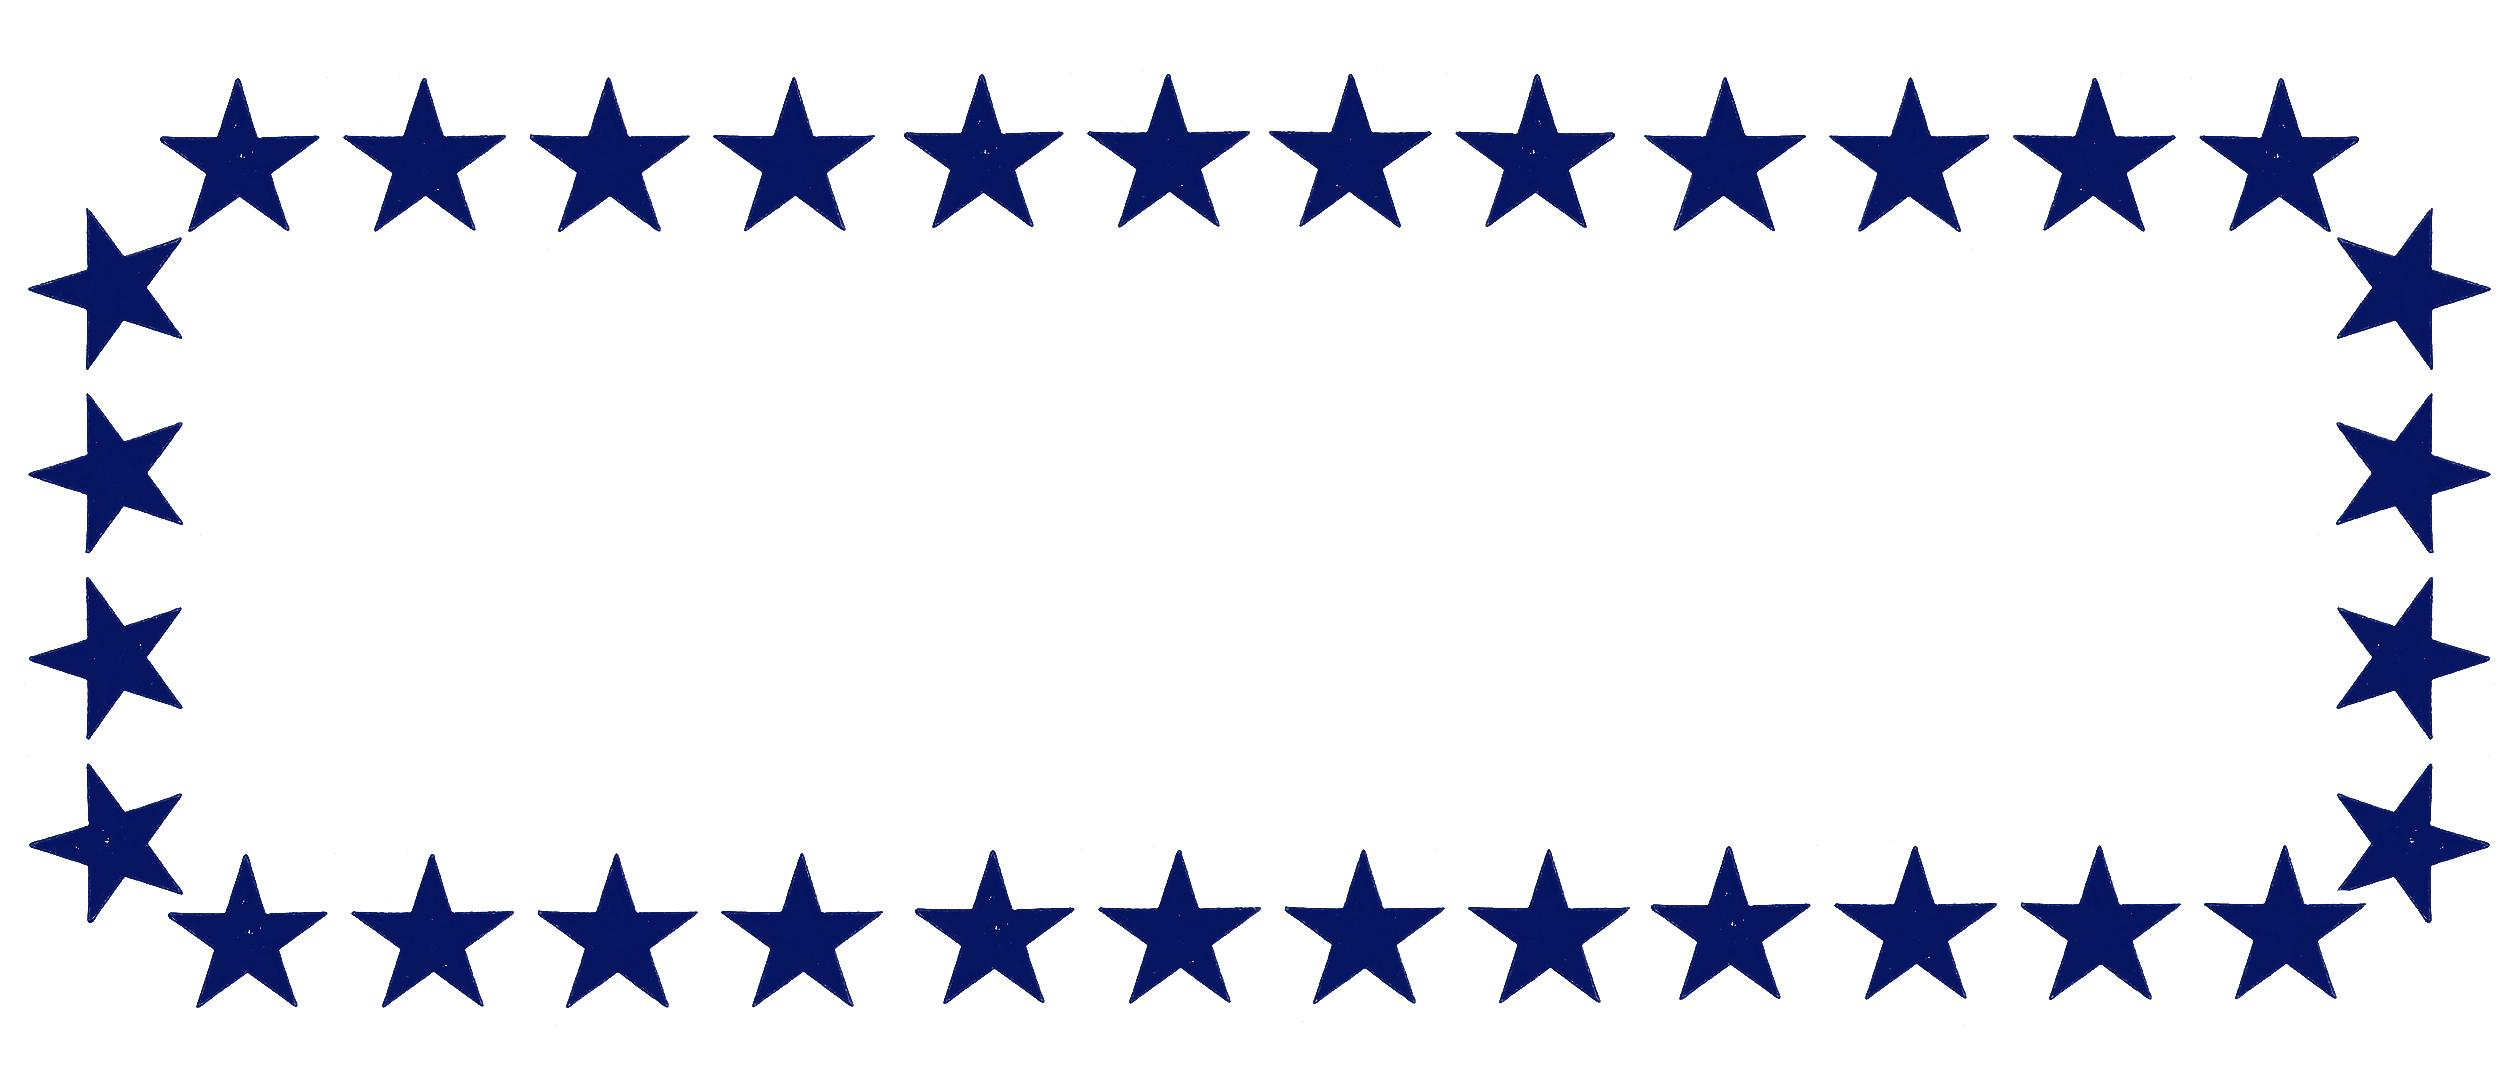 Blue Star Clipart Frame - Stars Clipart